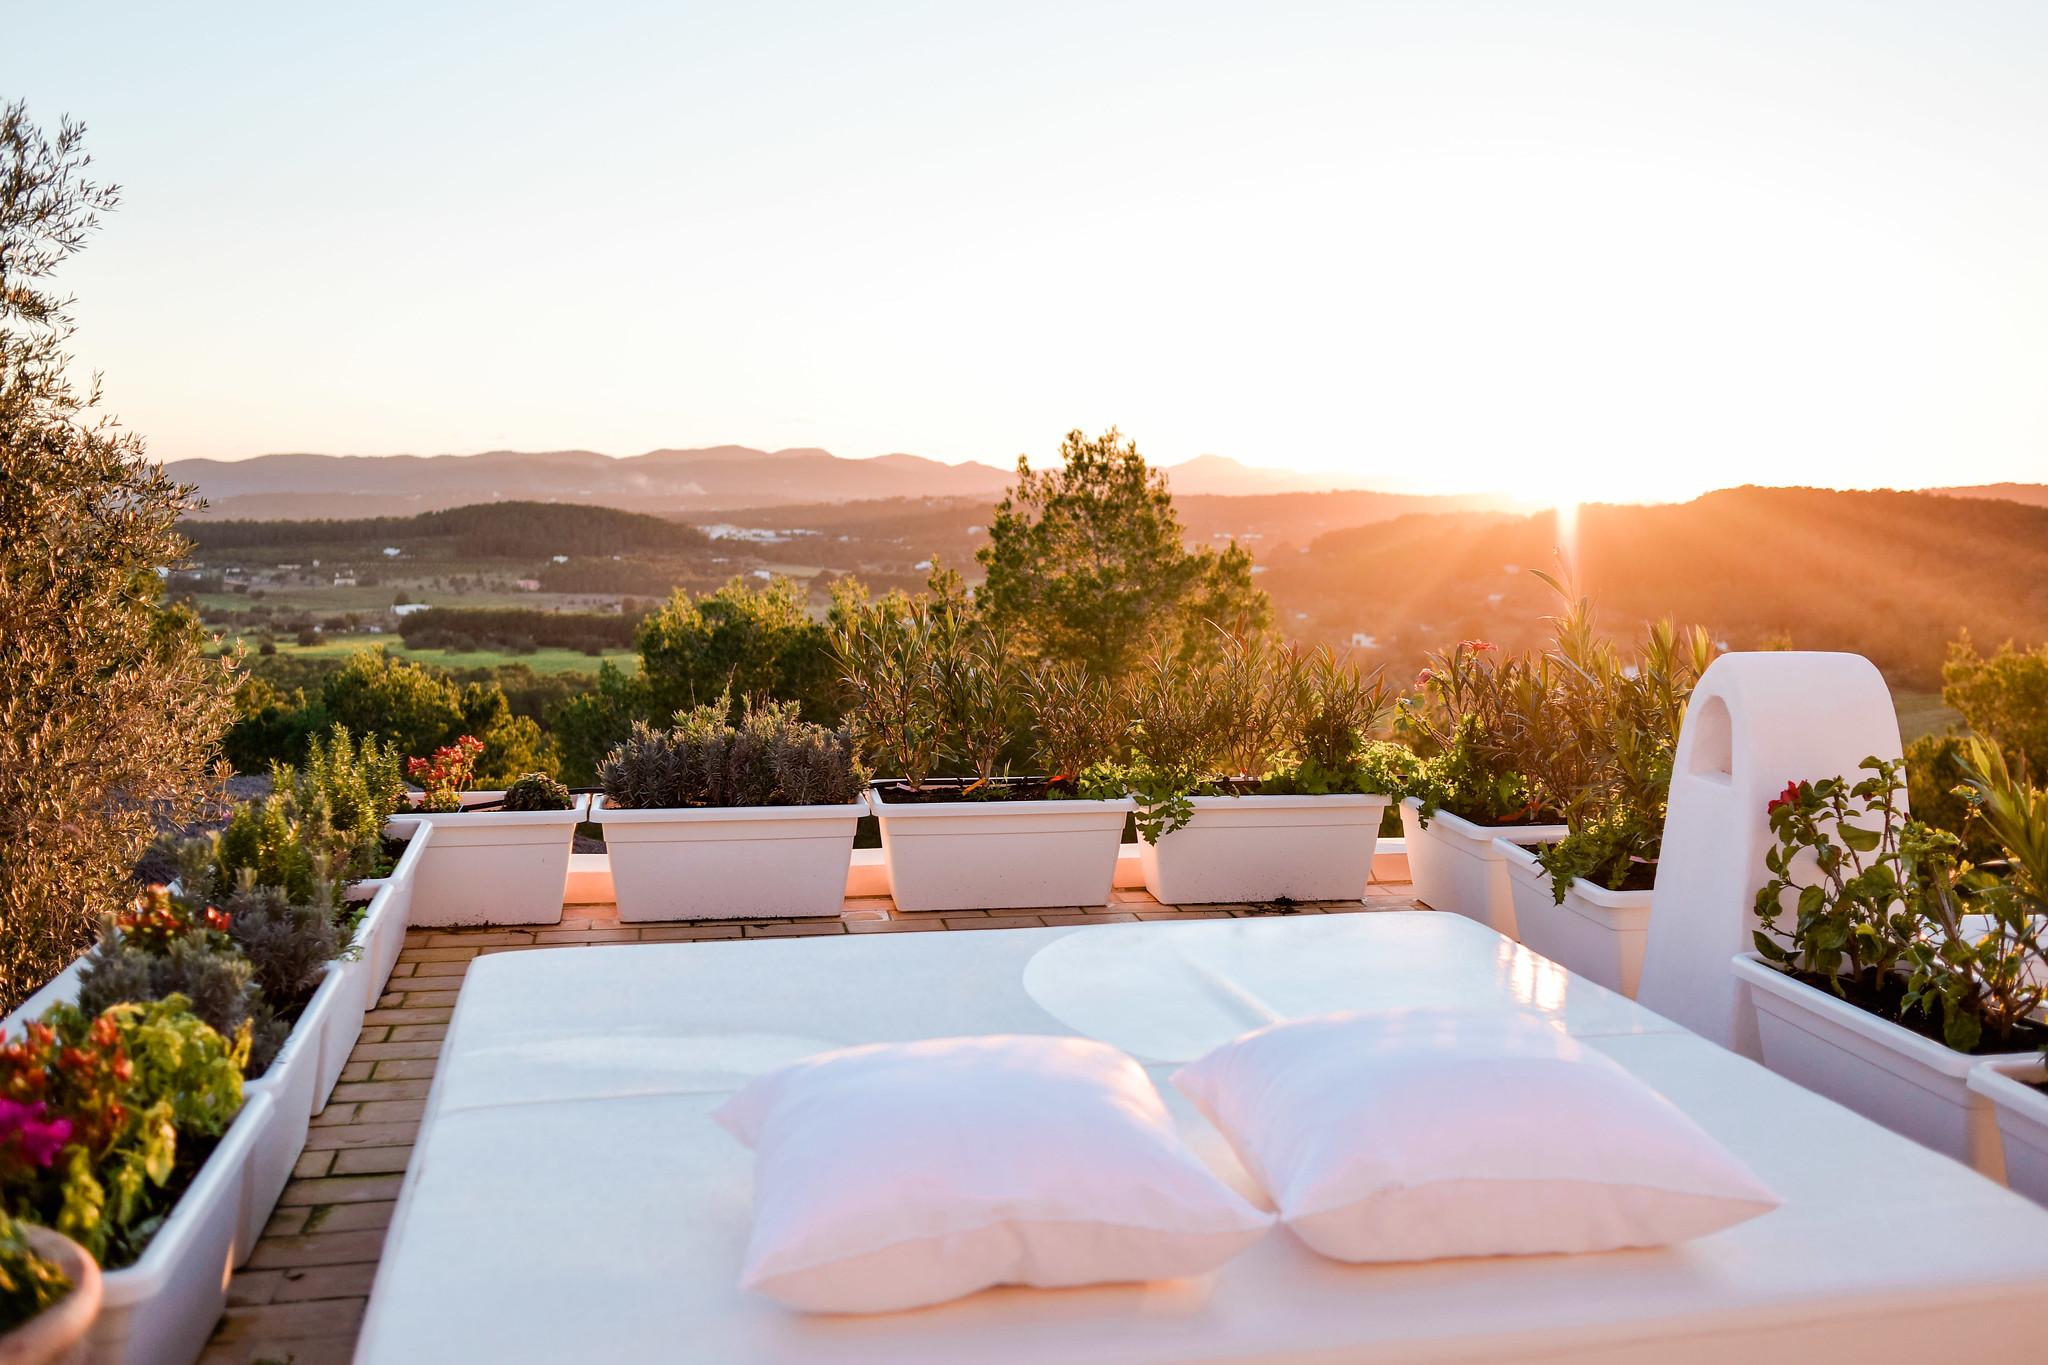 https://www.white-ibiza.com/wp-content/uploads/2020/05/white-ibiza-villas-can-lavanda-roof-chill-out.jpg